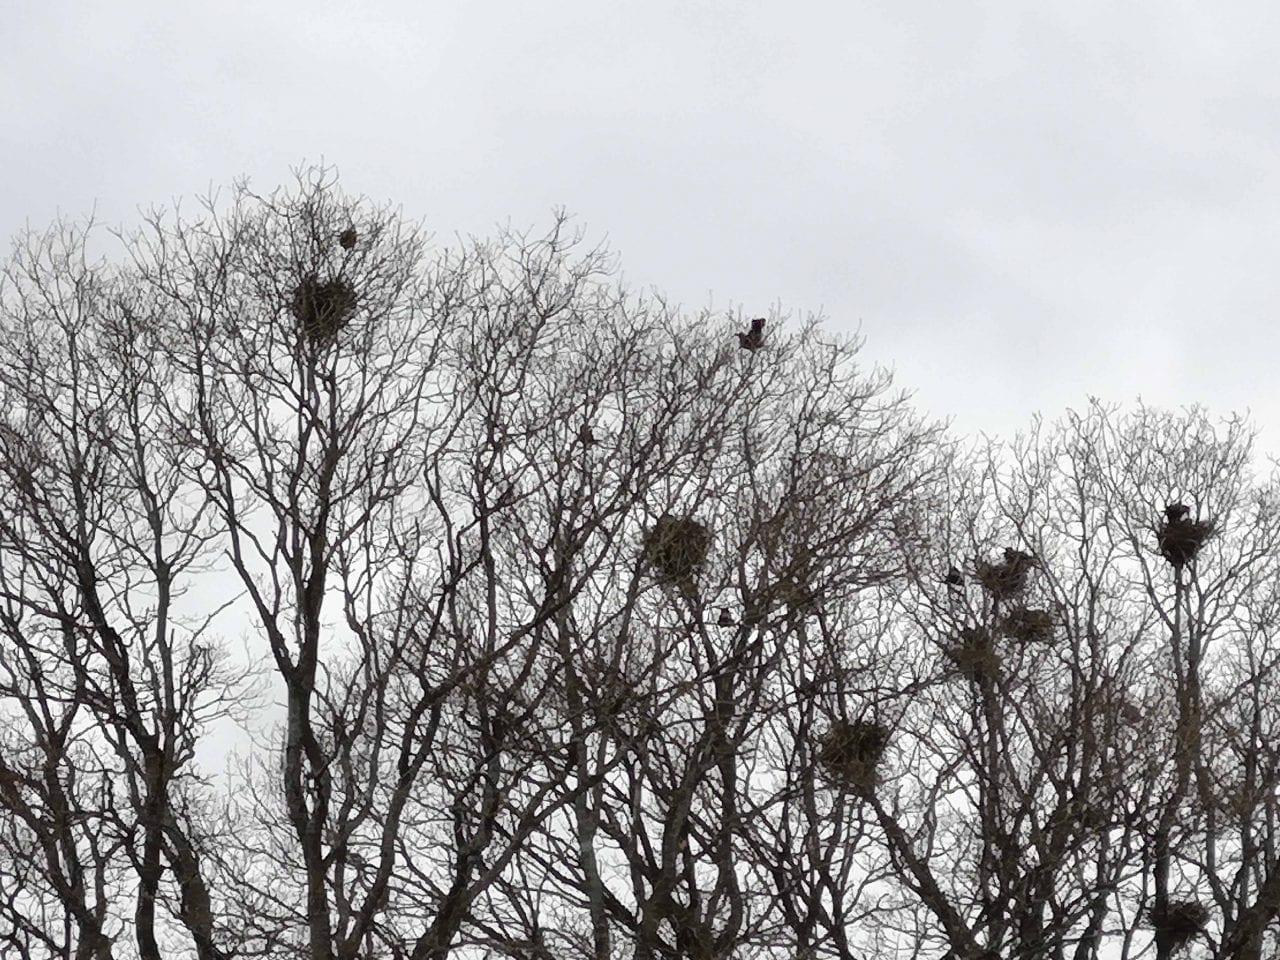 5 IMG_20210311_125345 Rook nesting Reduced